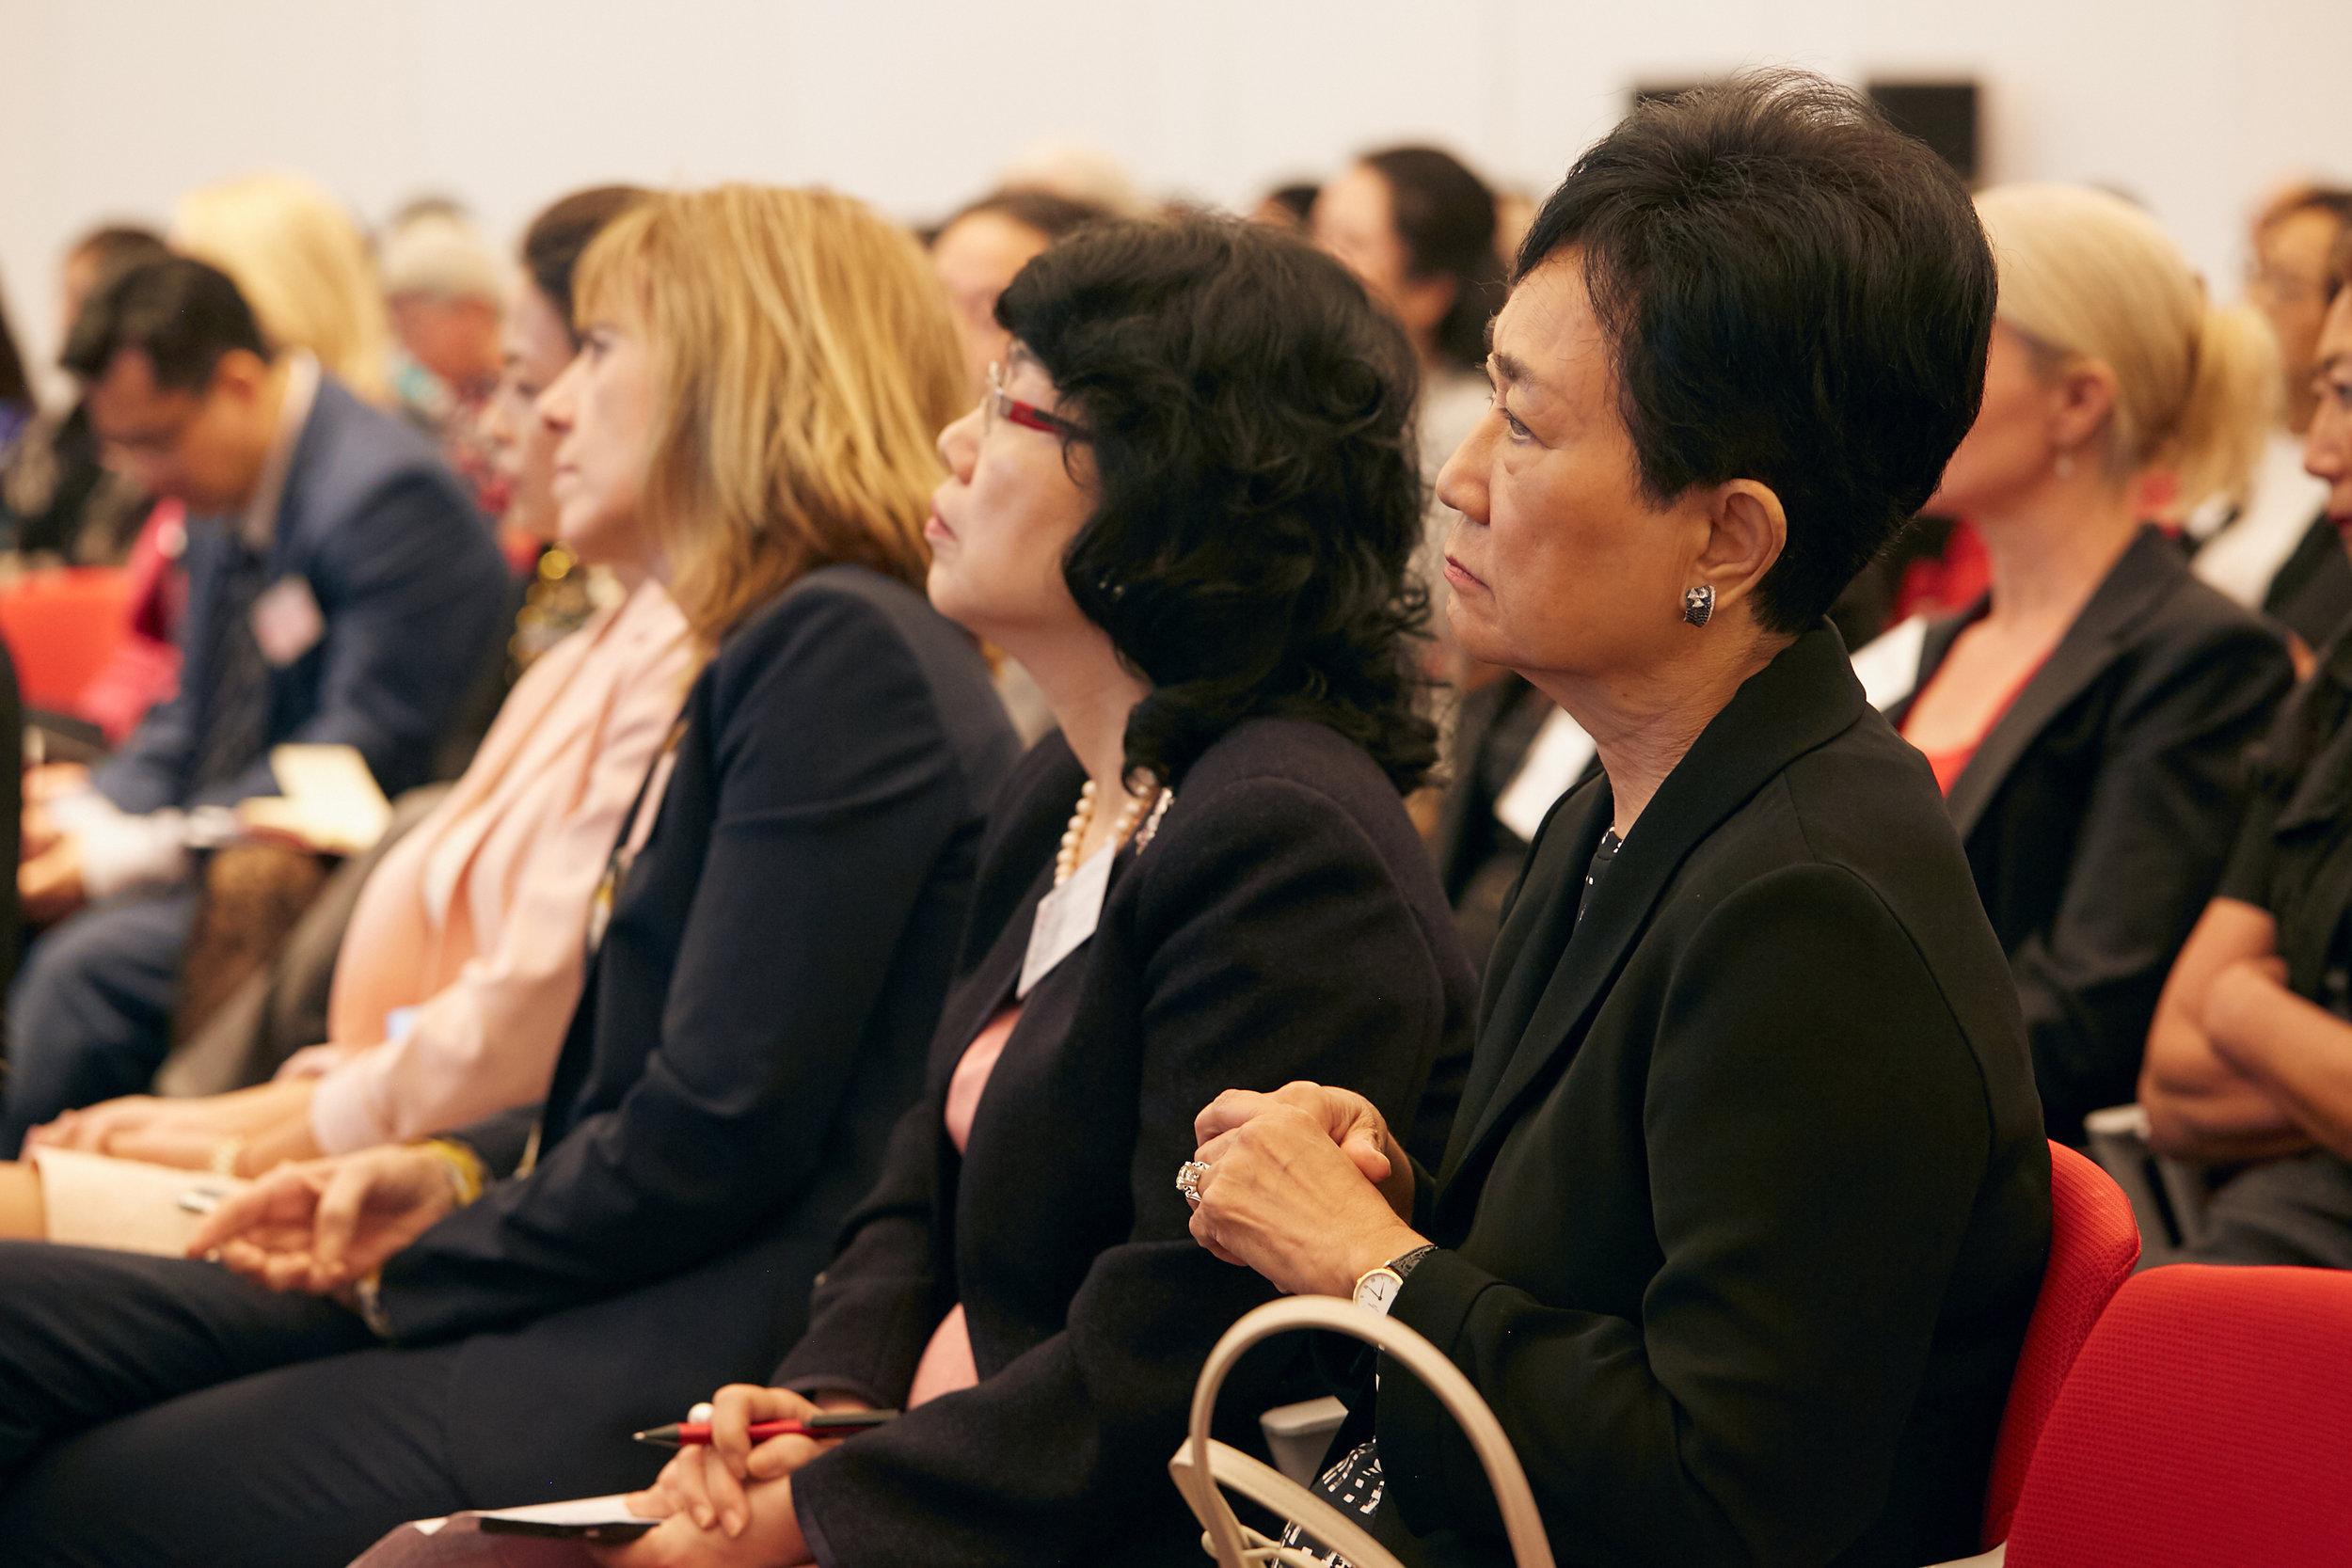 IWF-HK members attend the seminar